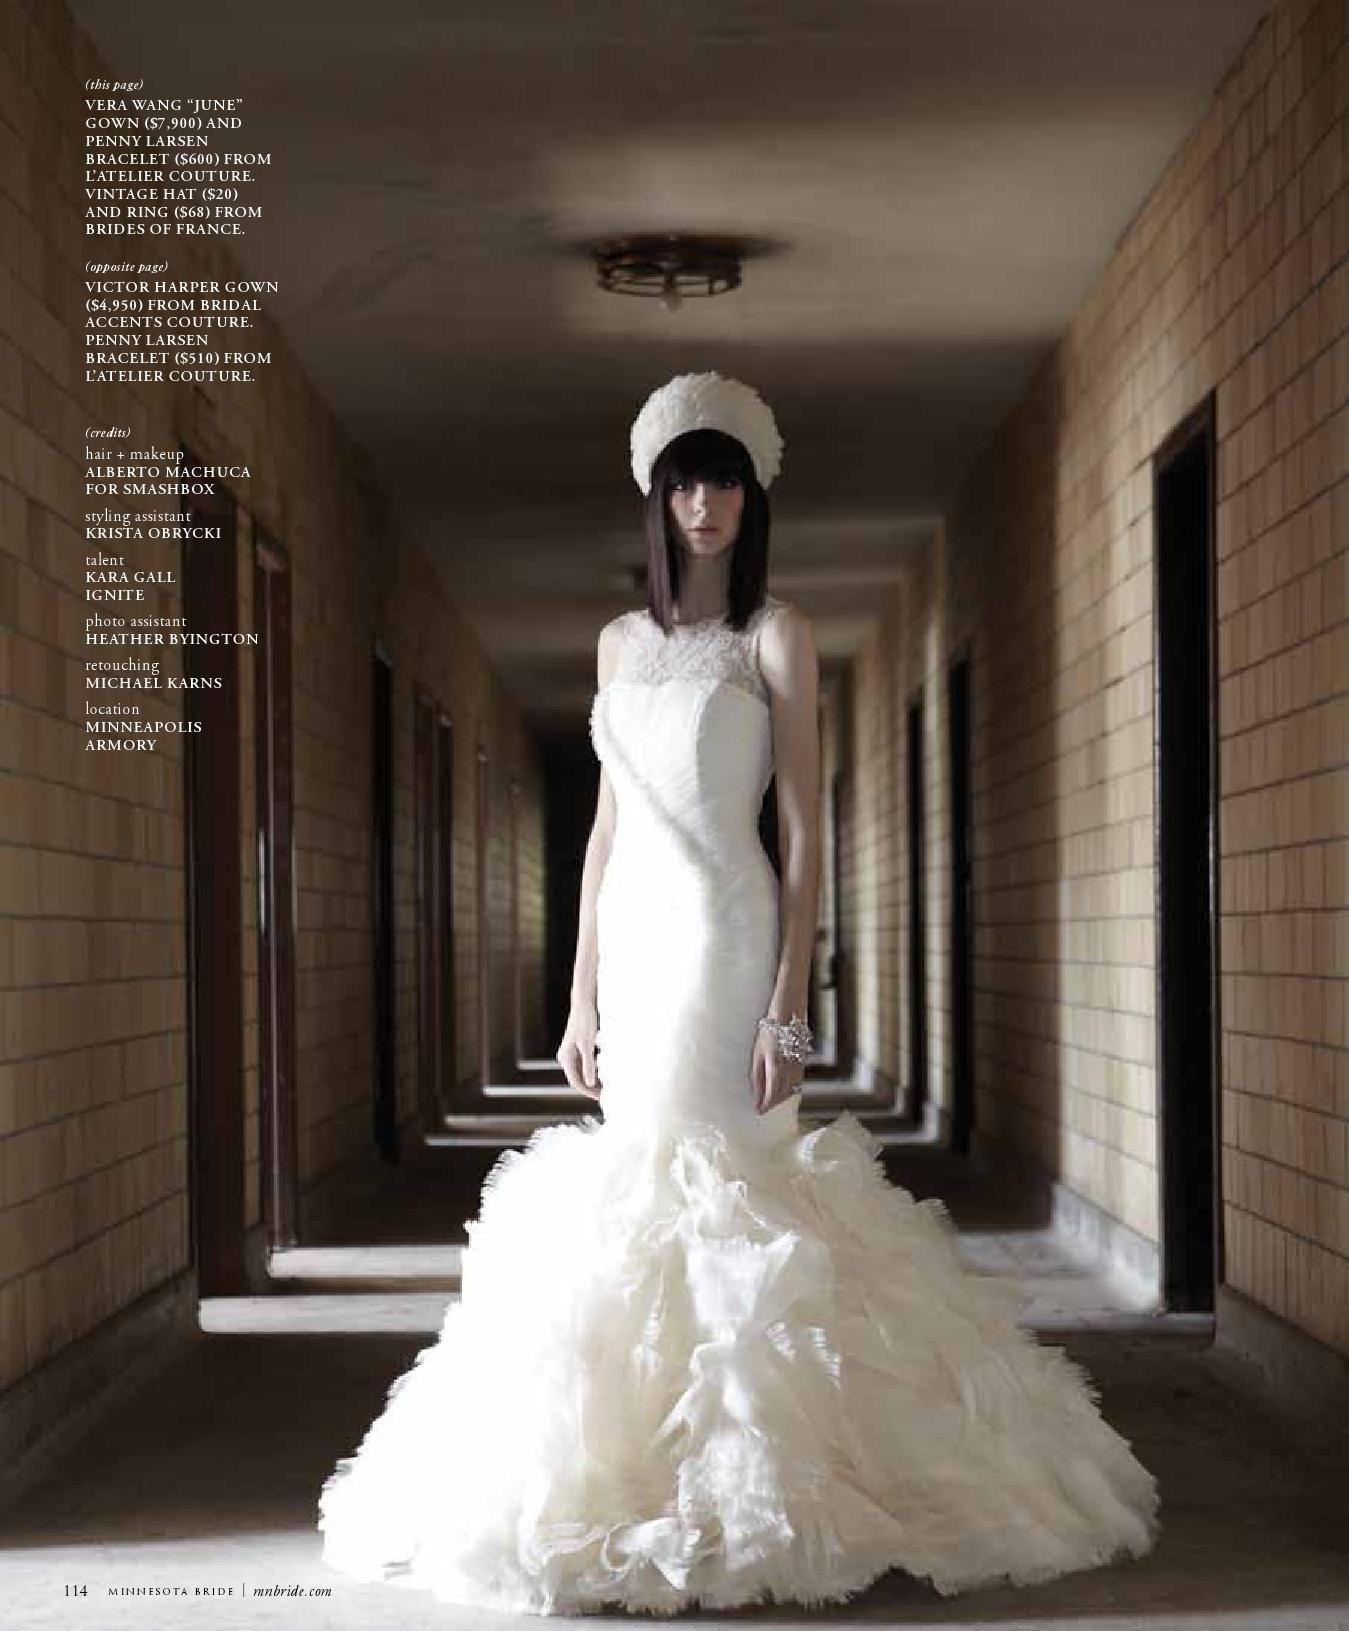 bridal editorial - Google Search